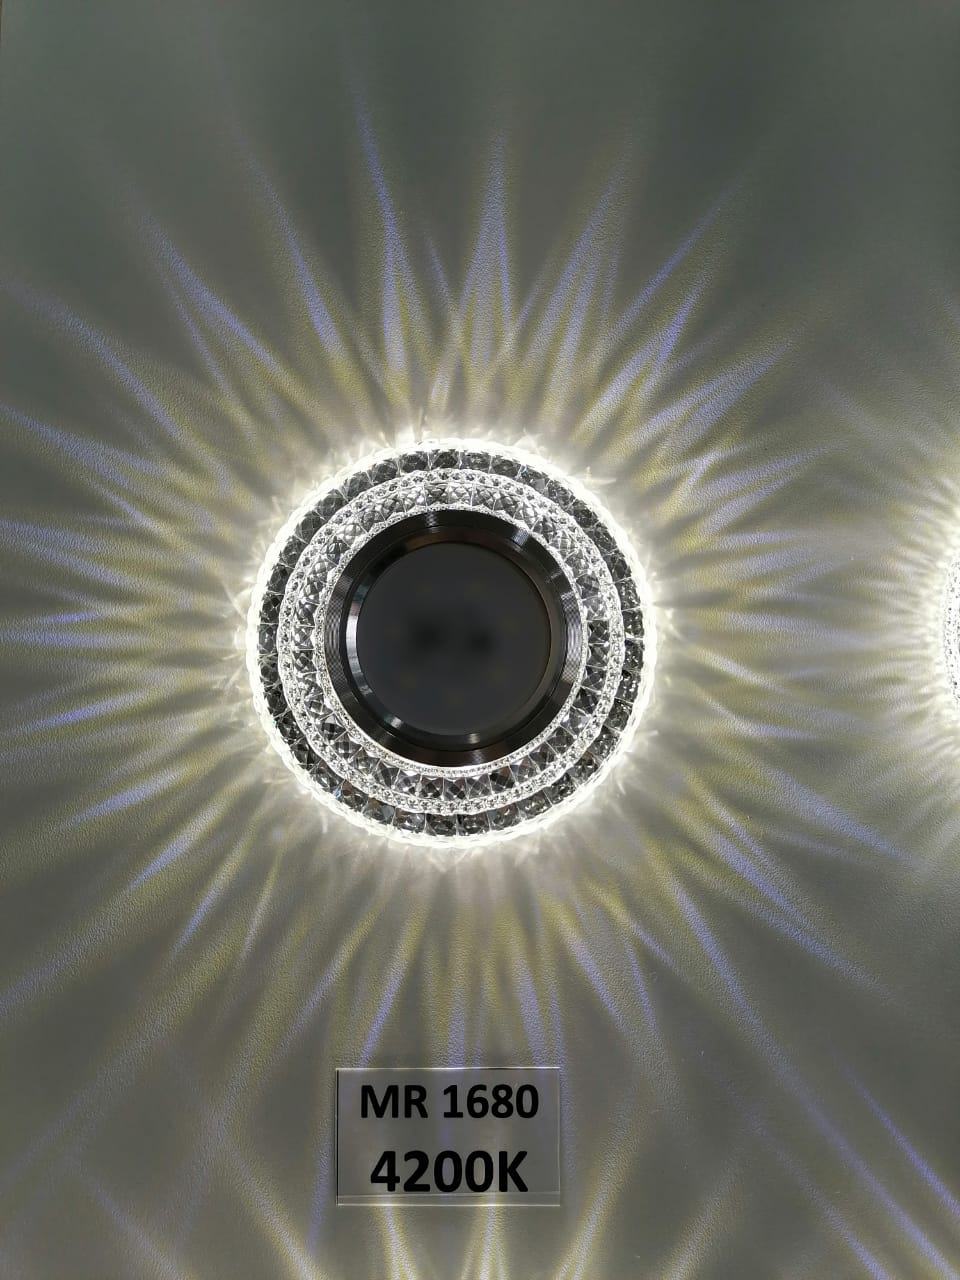 MR 1680